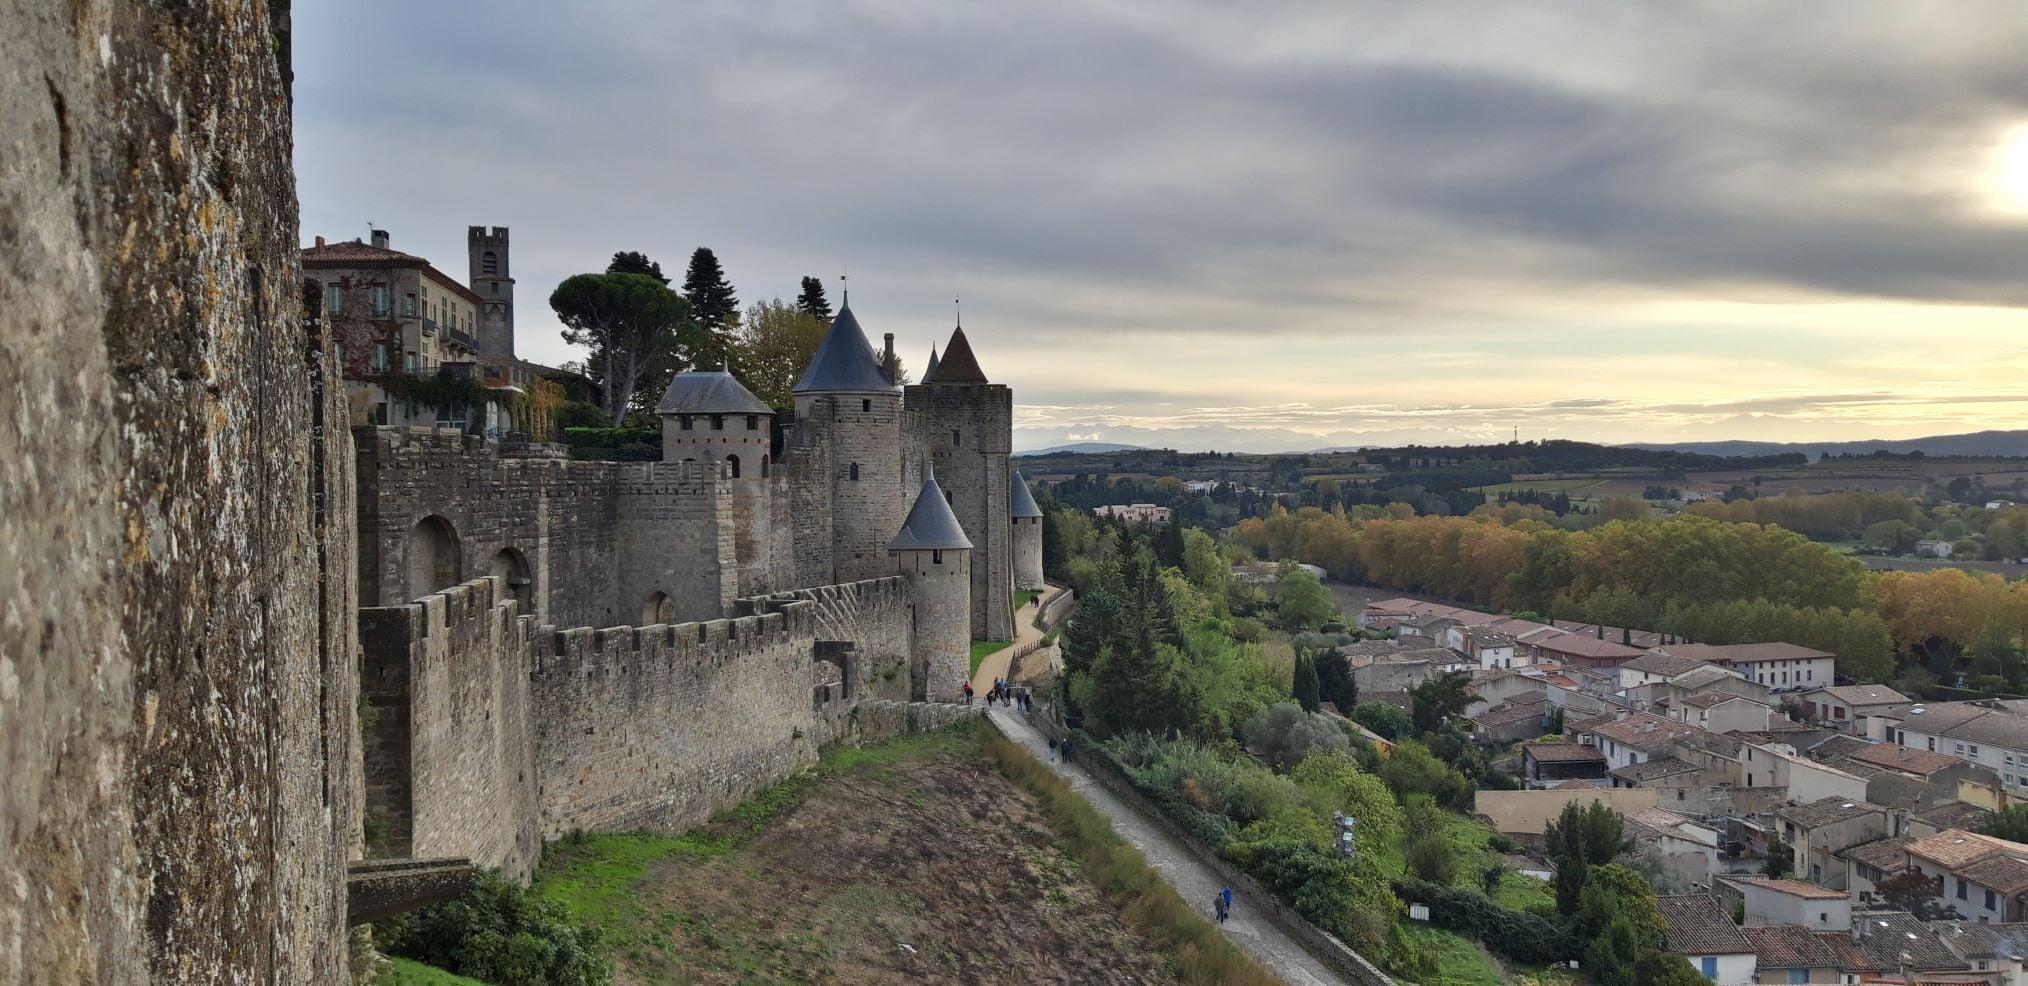 Zigzag through France (part 4/4)